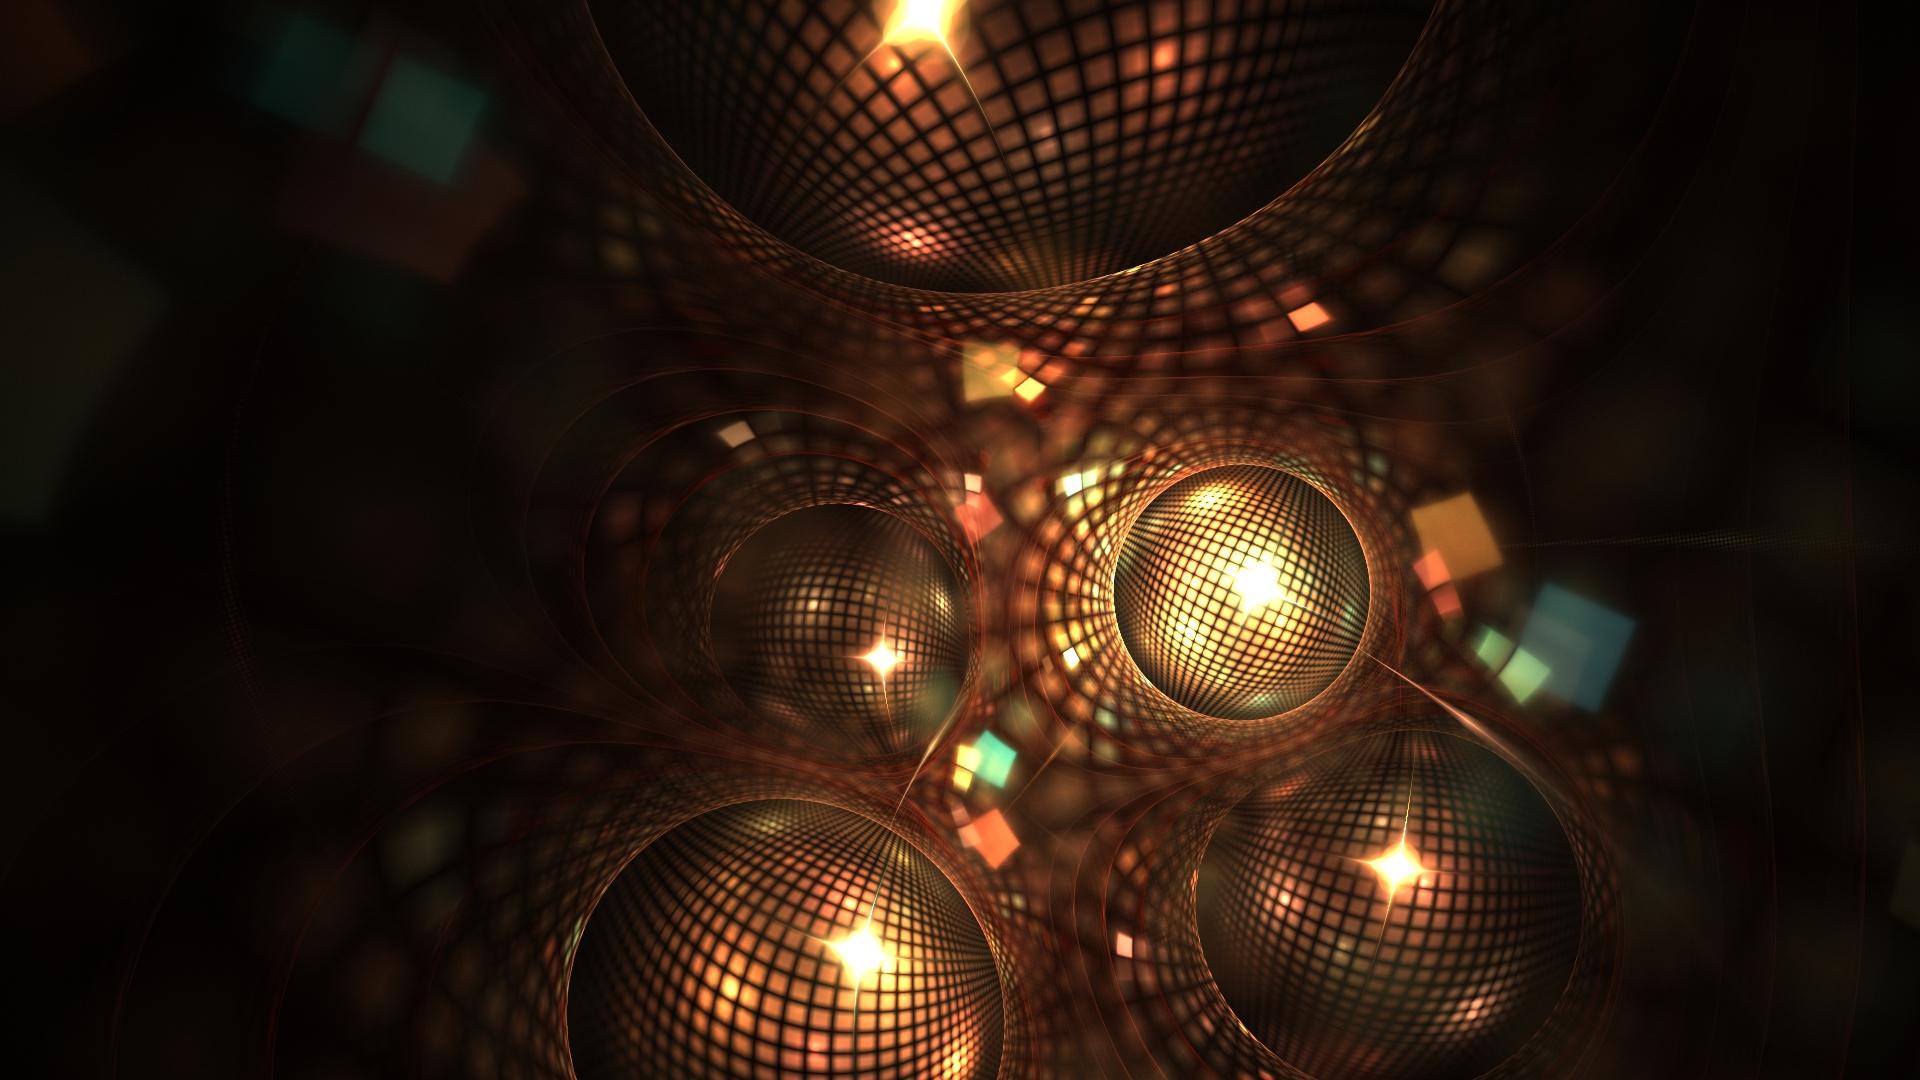 1 disco ball hd wallpapers